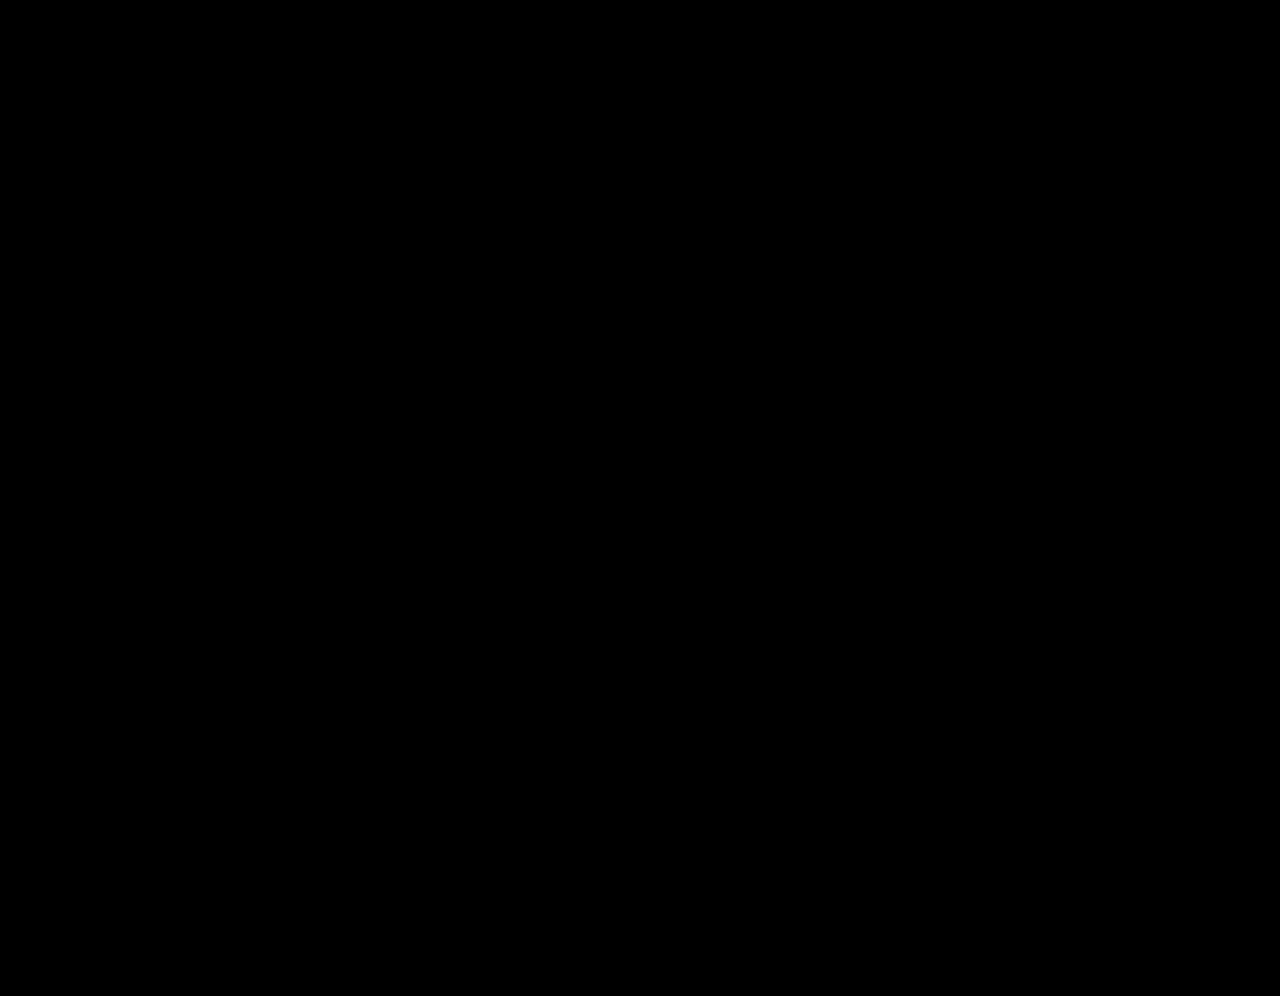 elements-35448_1280